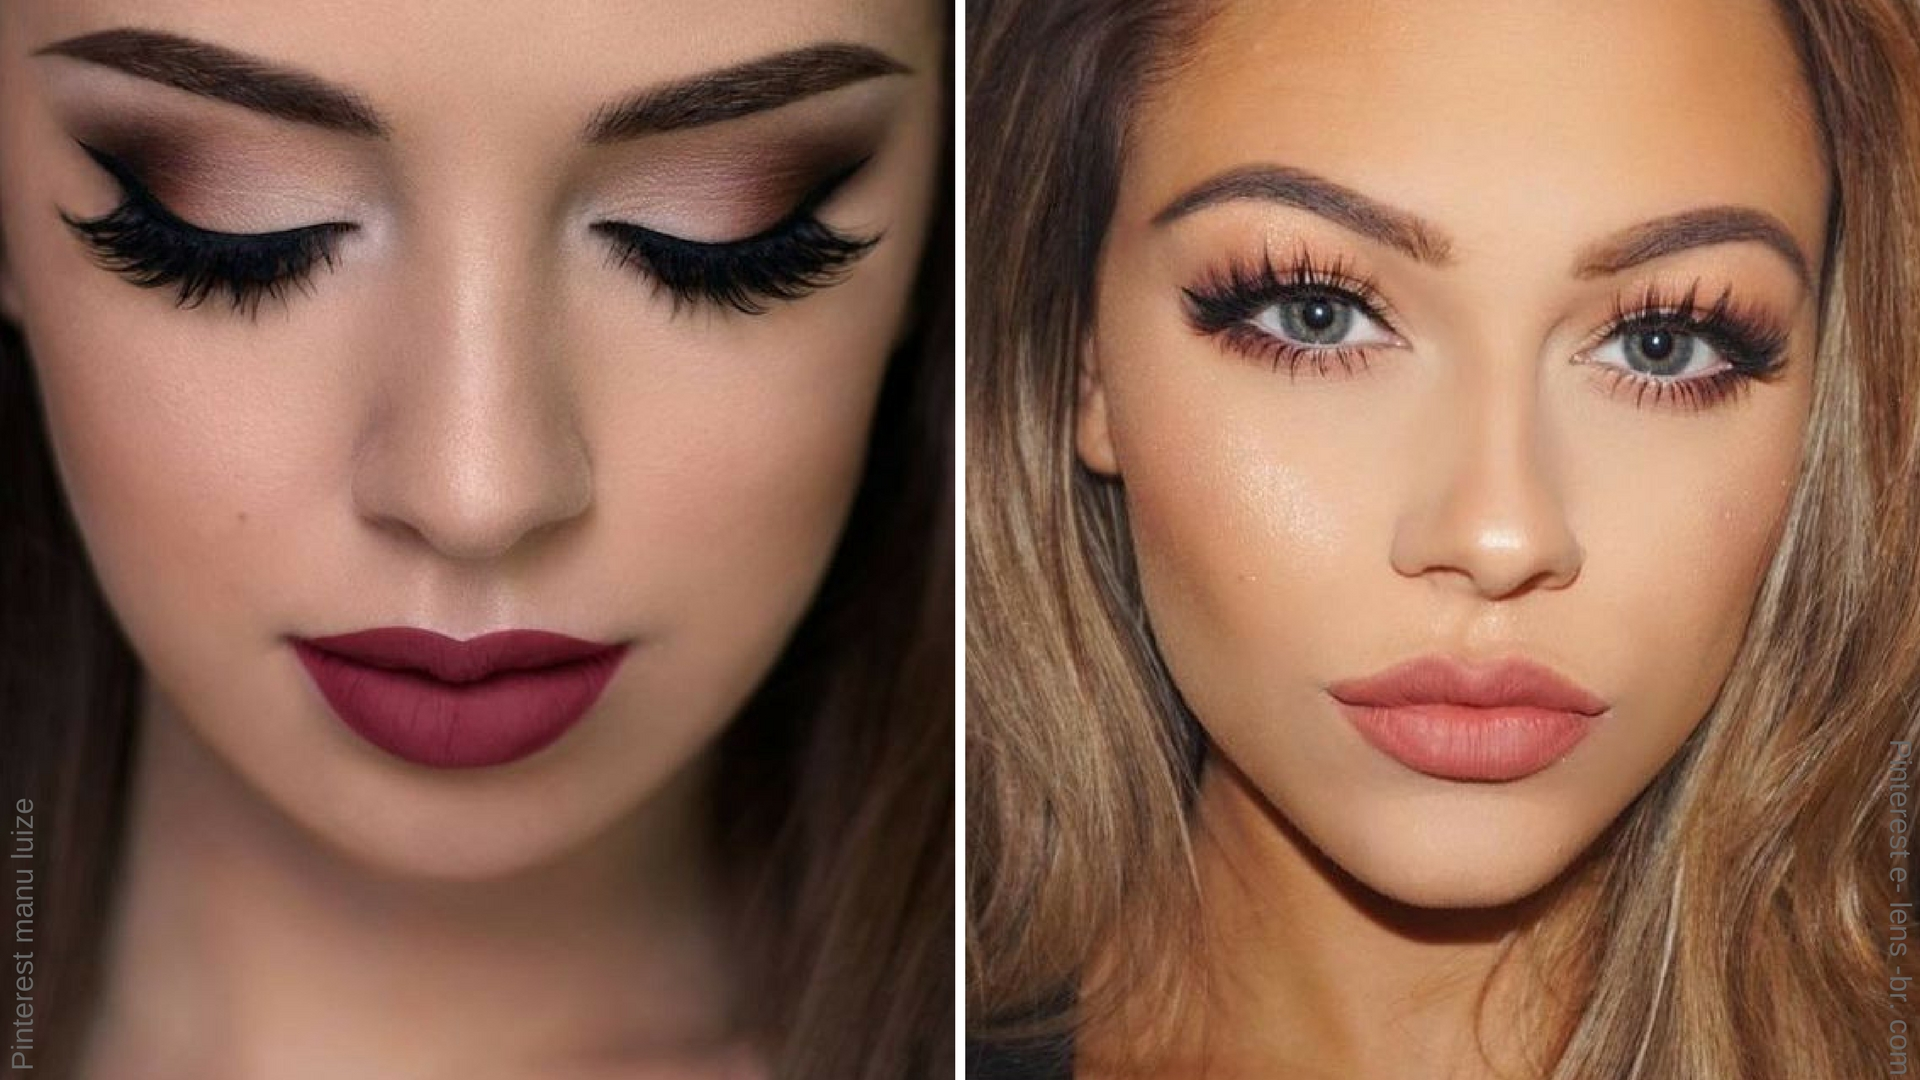 tendências de beleza: cílios poderosos tendência beleza 2018